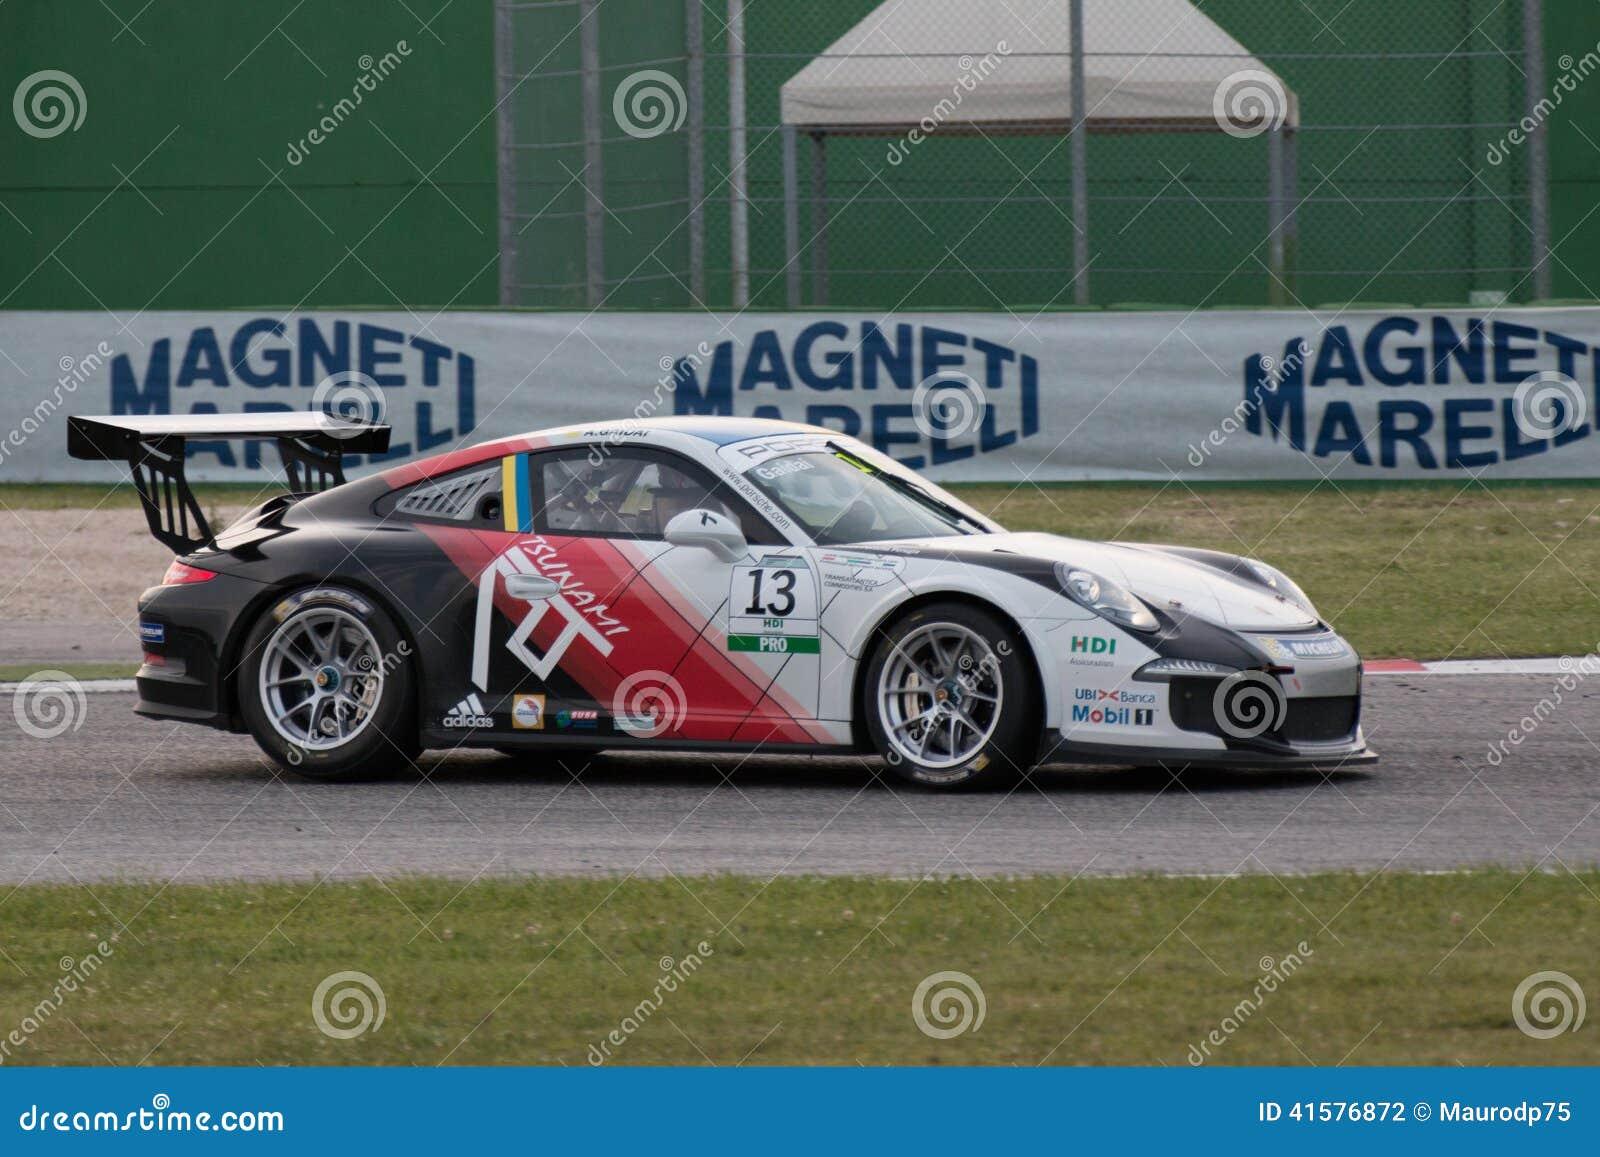 Porsche 911 Gt3 Cup Race Car Editorial Photography Image Of